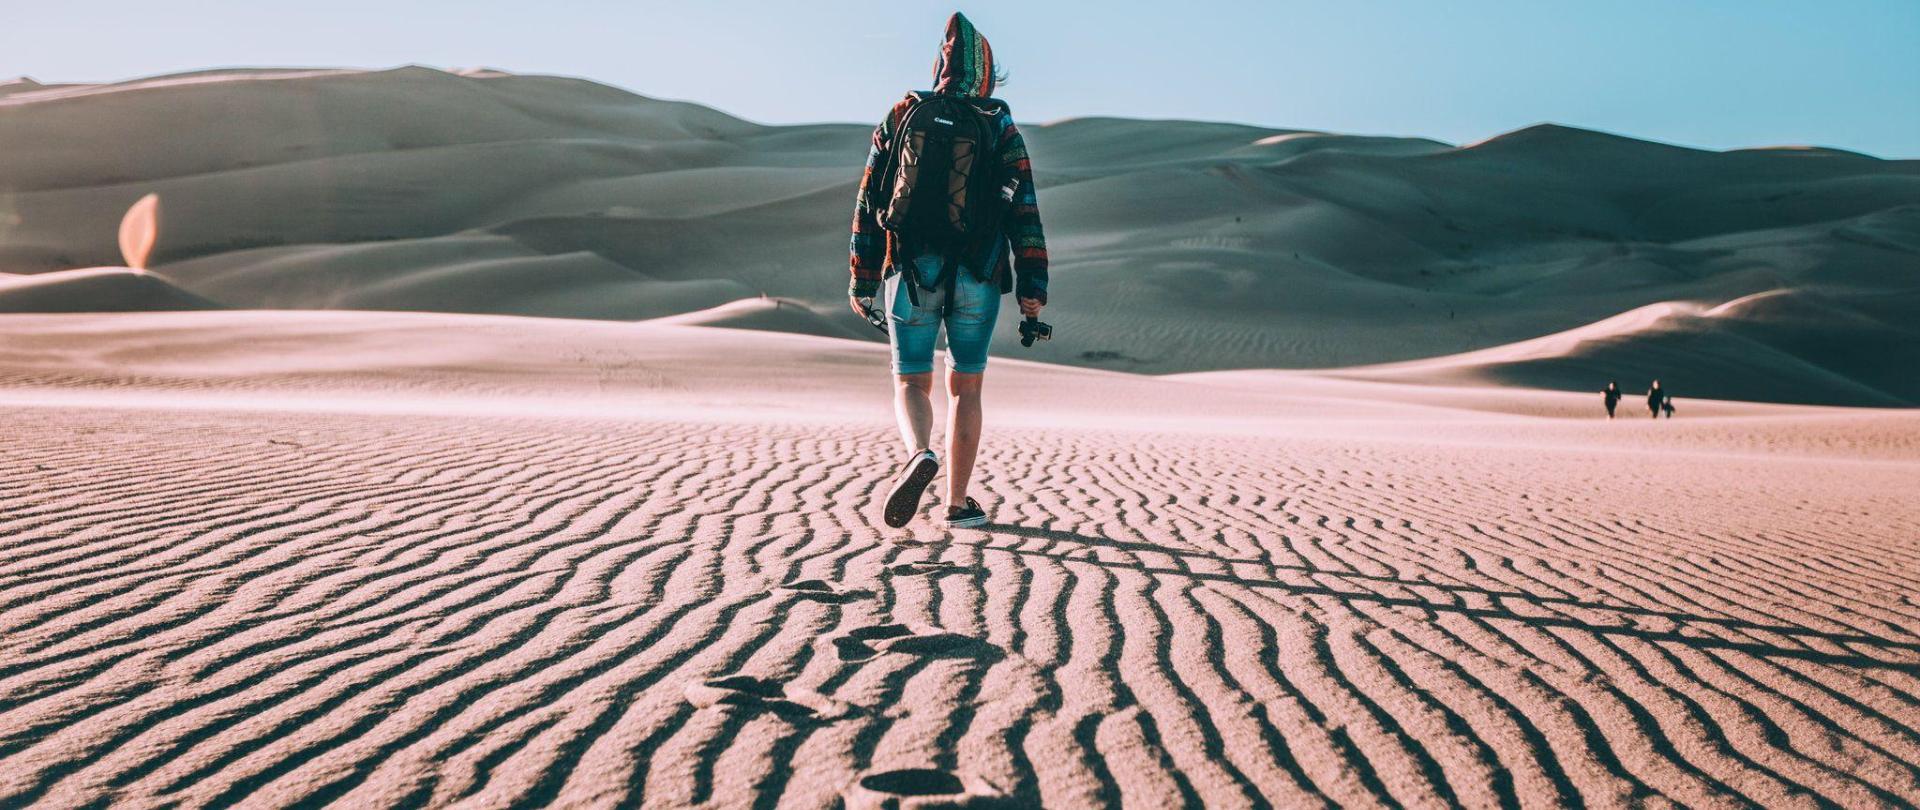 sand-dune.jpeg